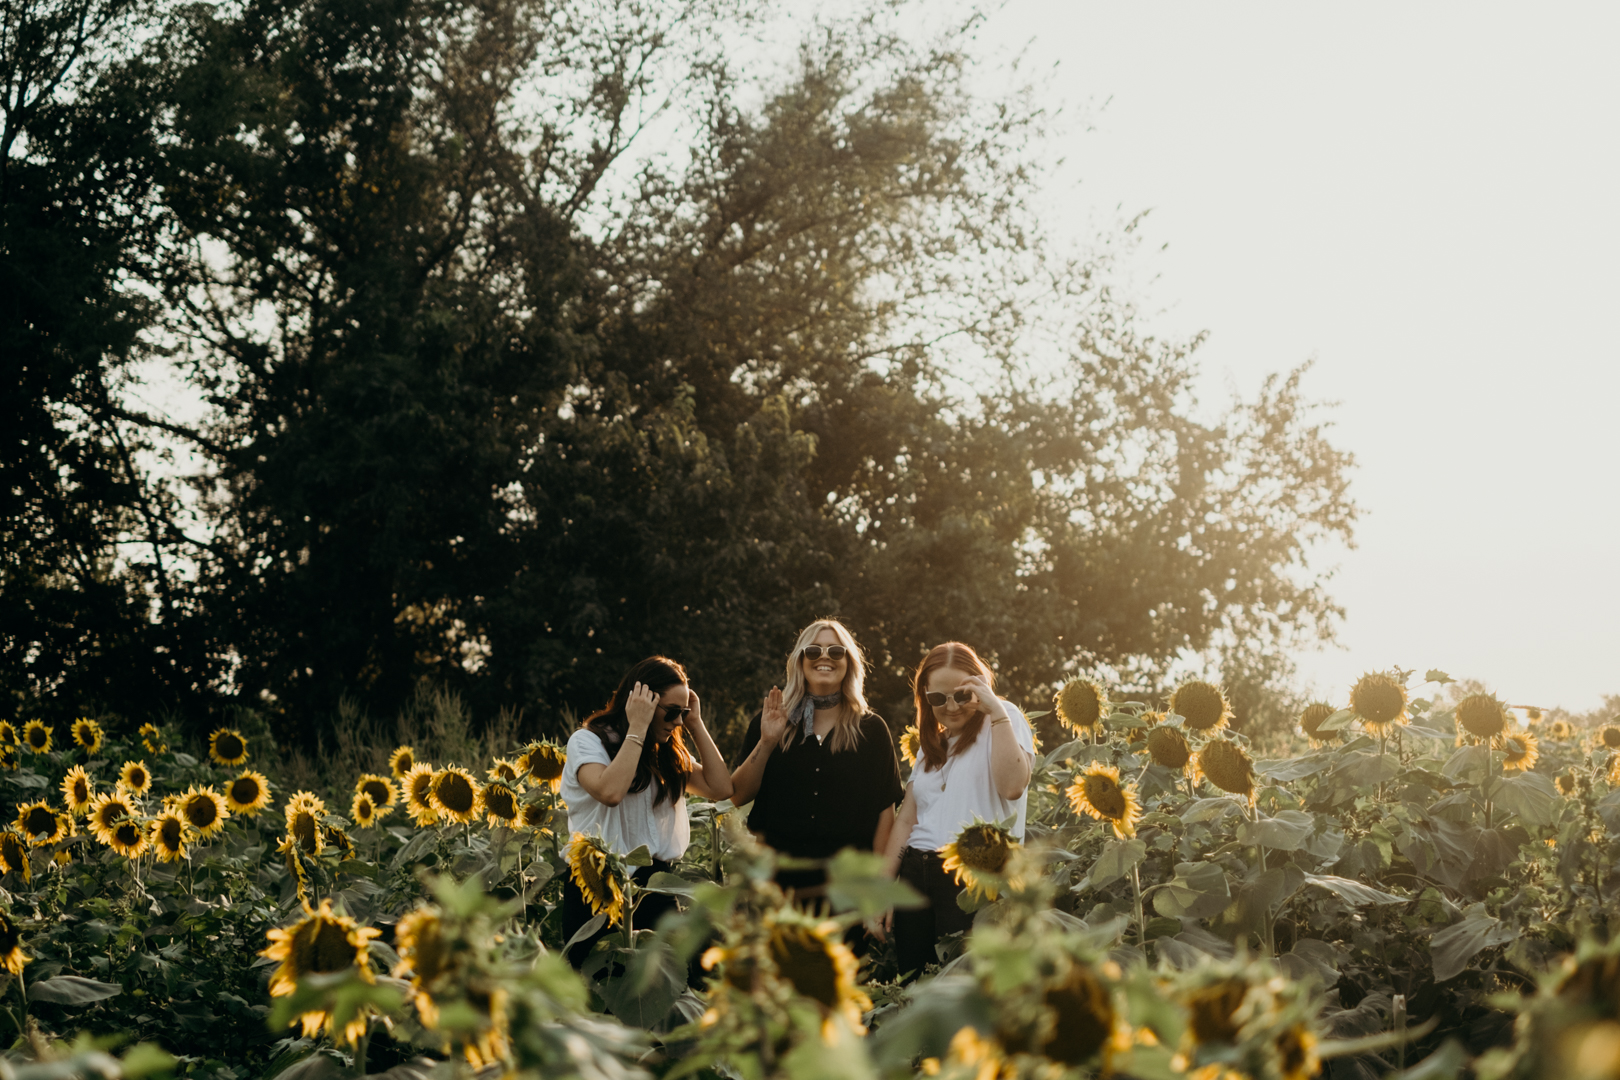 20170909_Grinters Farms Sunflower Fields Lawrence Kansas__6.jpg